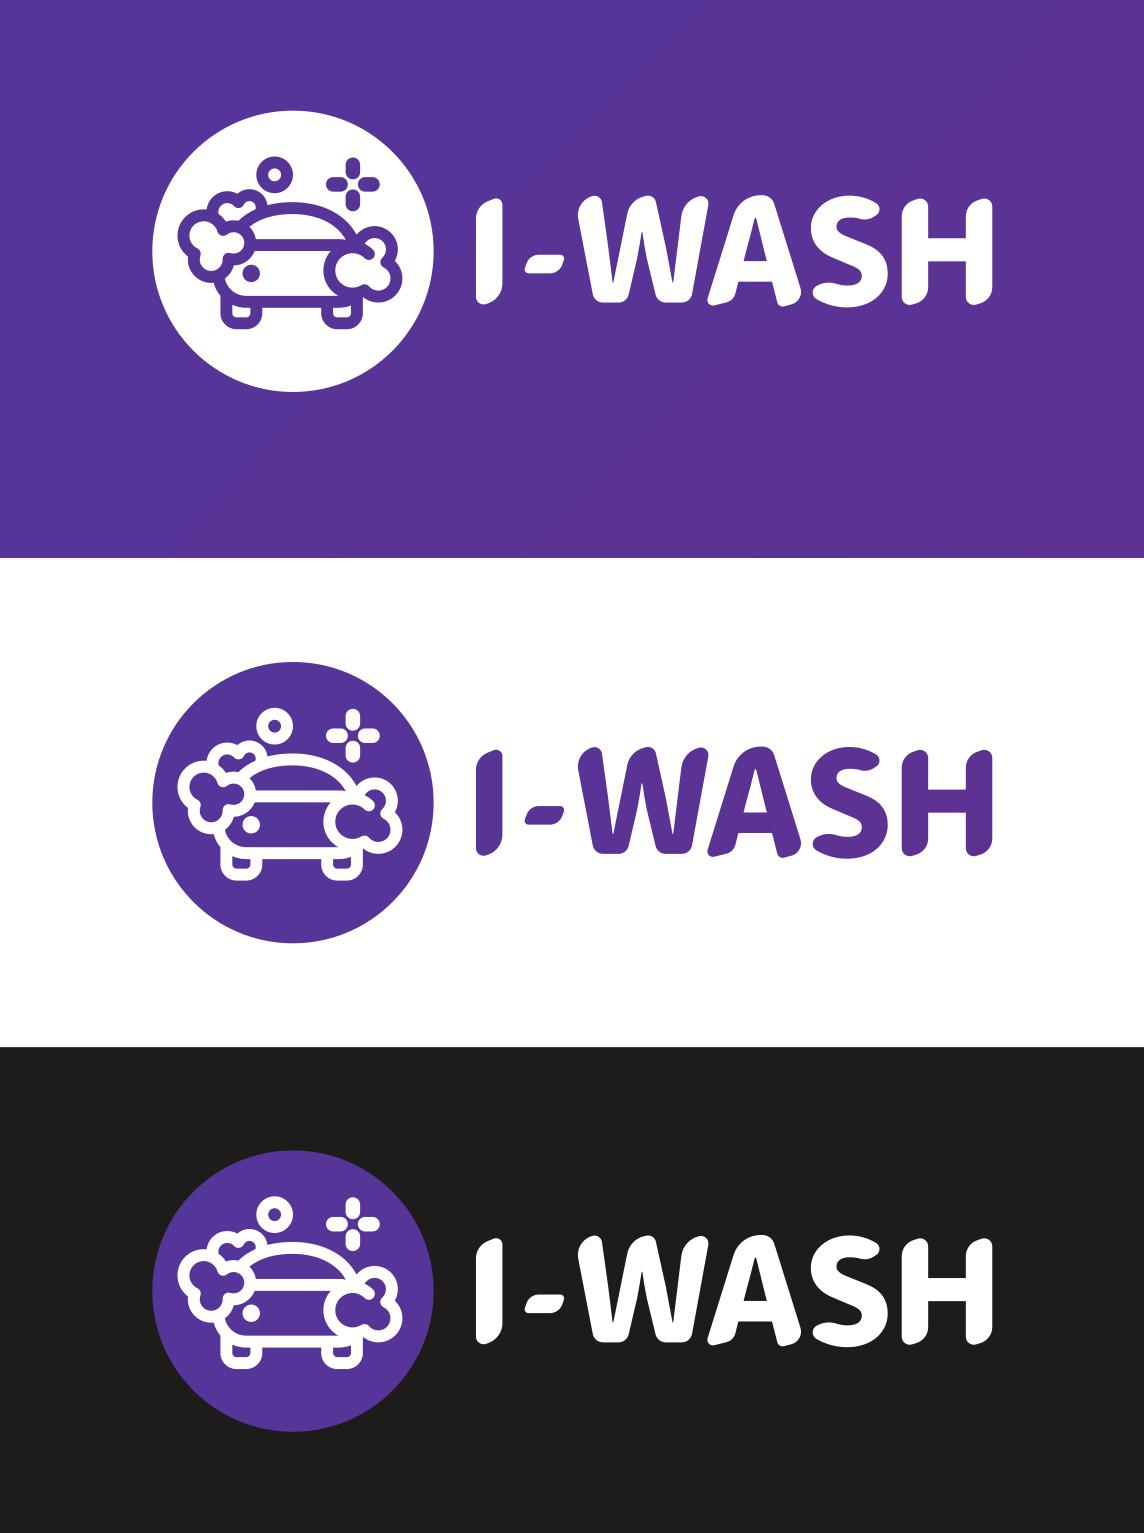 Iwash logo